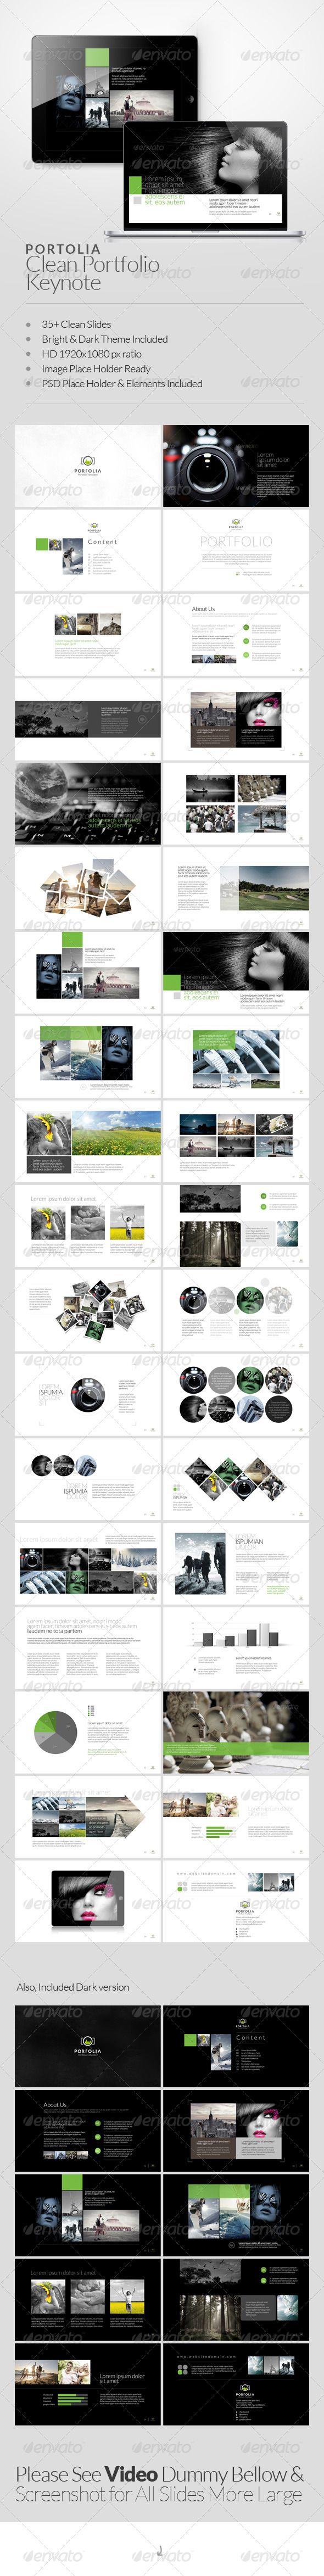 Portolia Multipurpose Clean Portfolio Keynote | Keynote theme / template